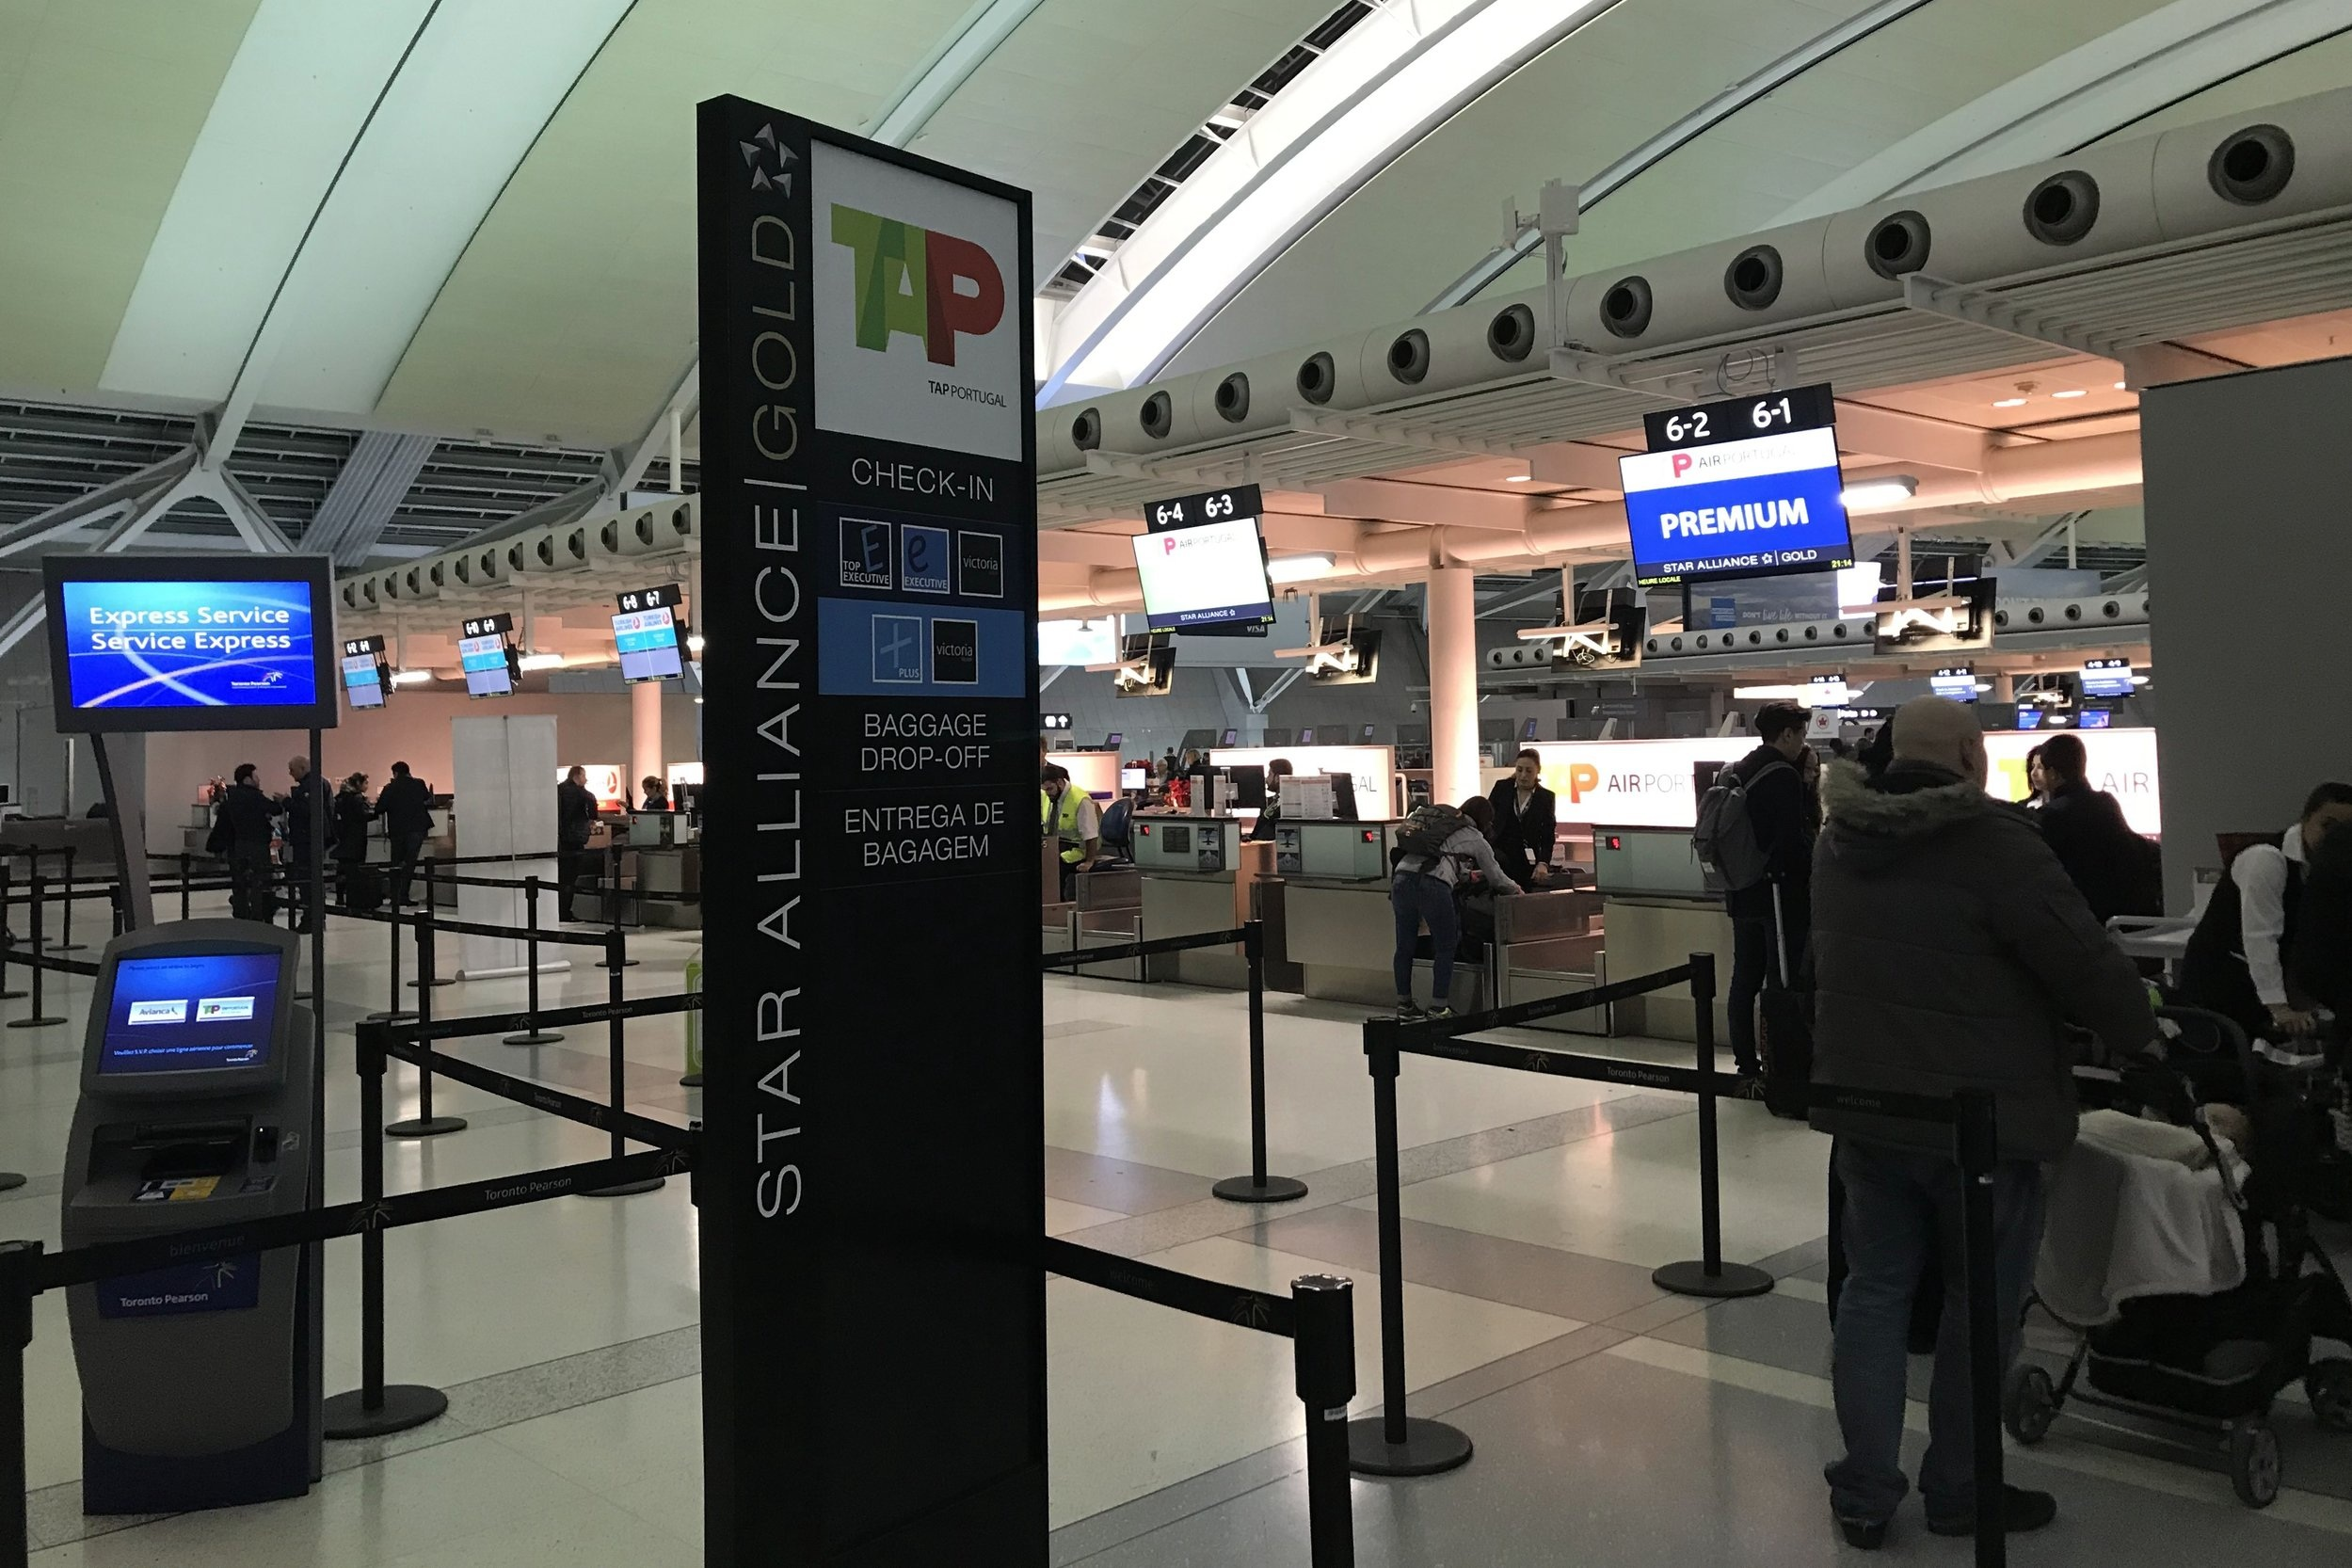 TAP Air Portugal check-in, Toronto Pearson